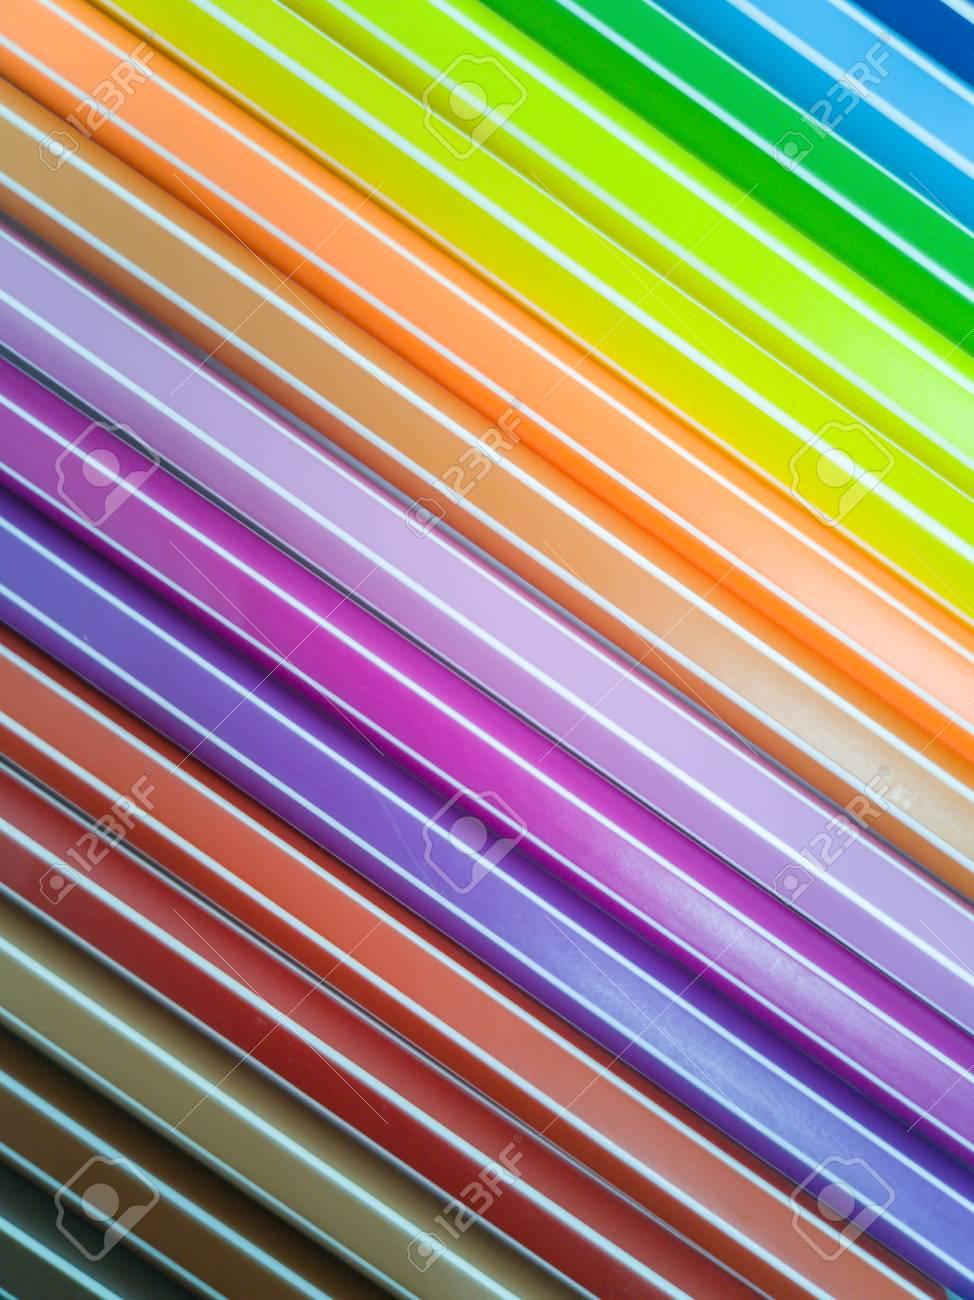 Set of colorful marker paint pen vibrant background - 106223028